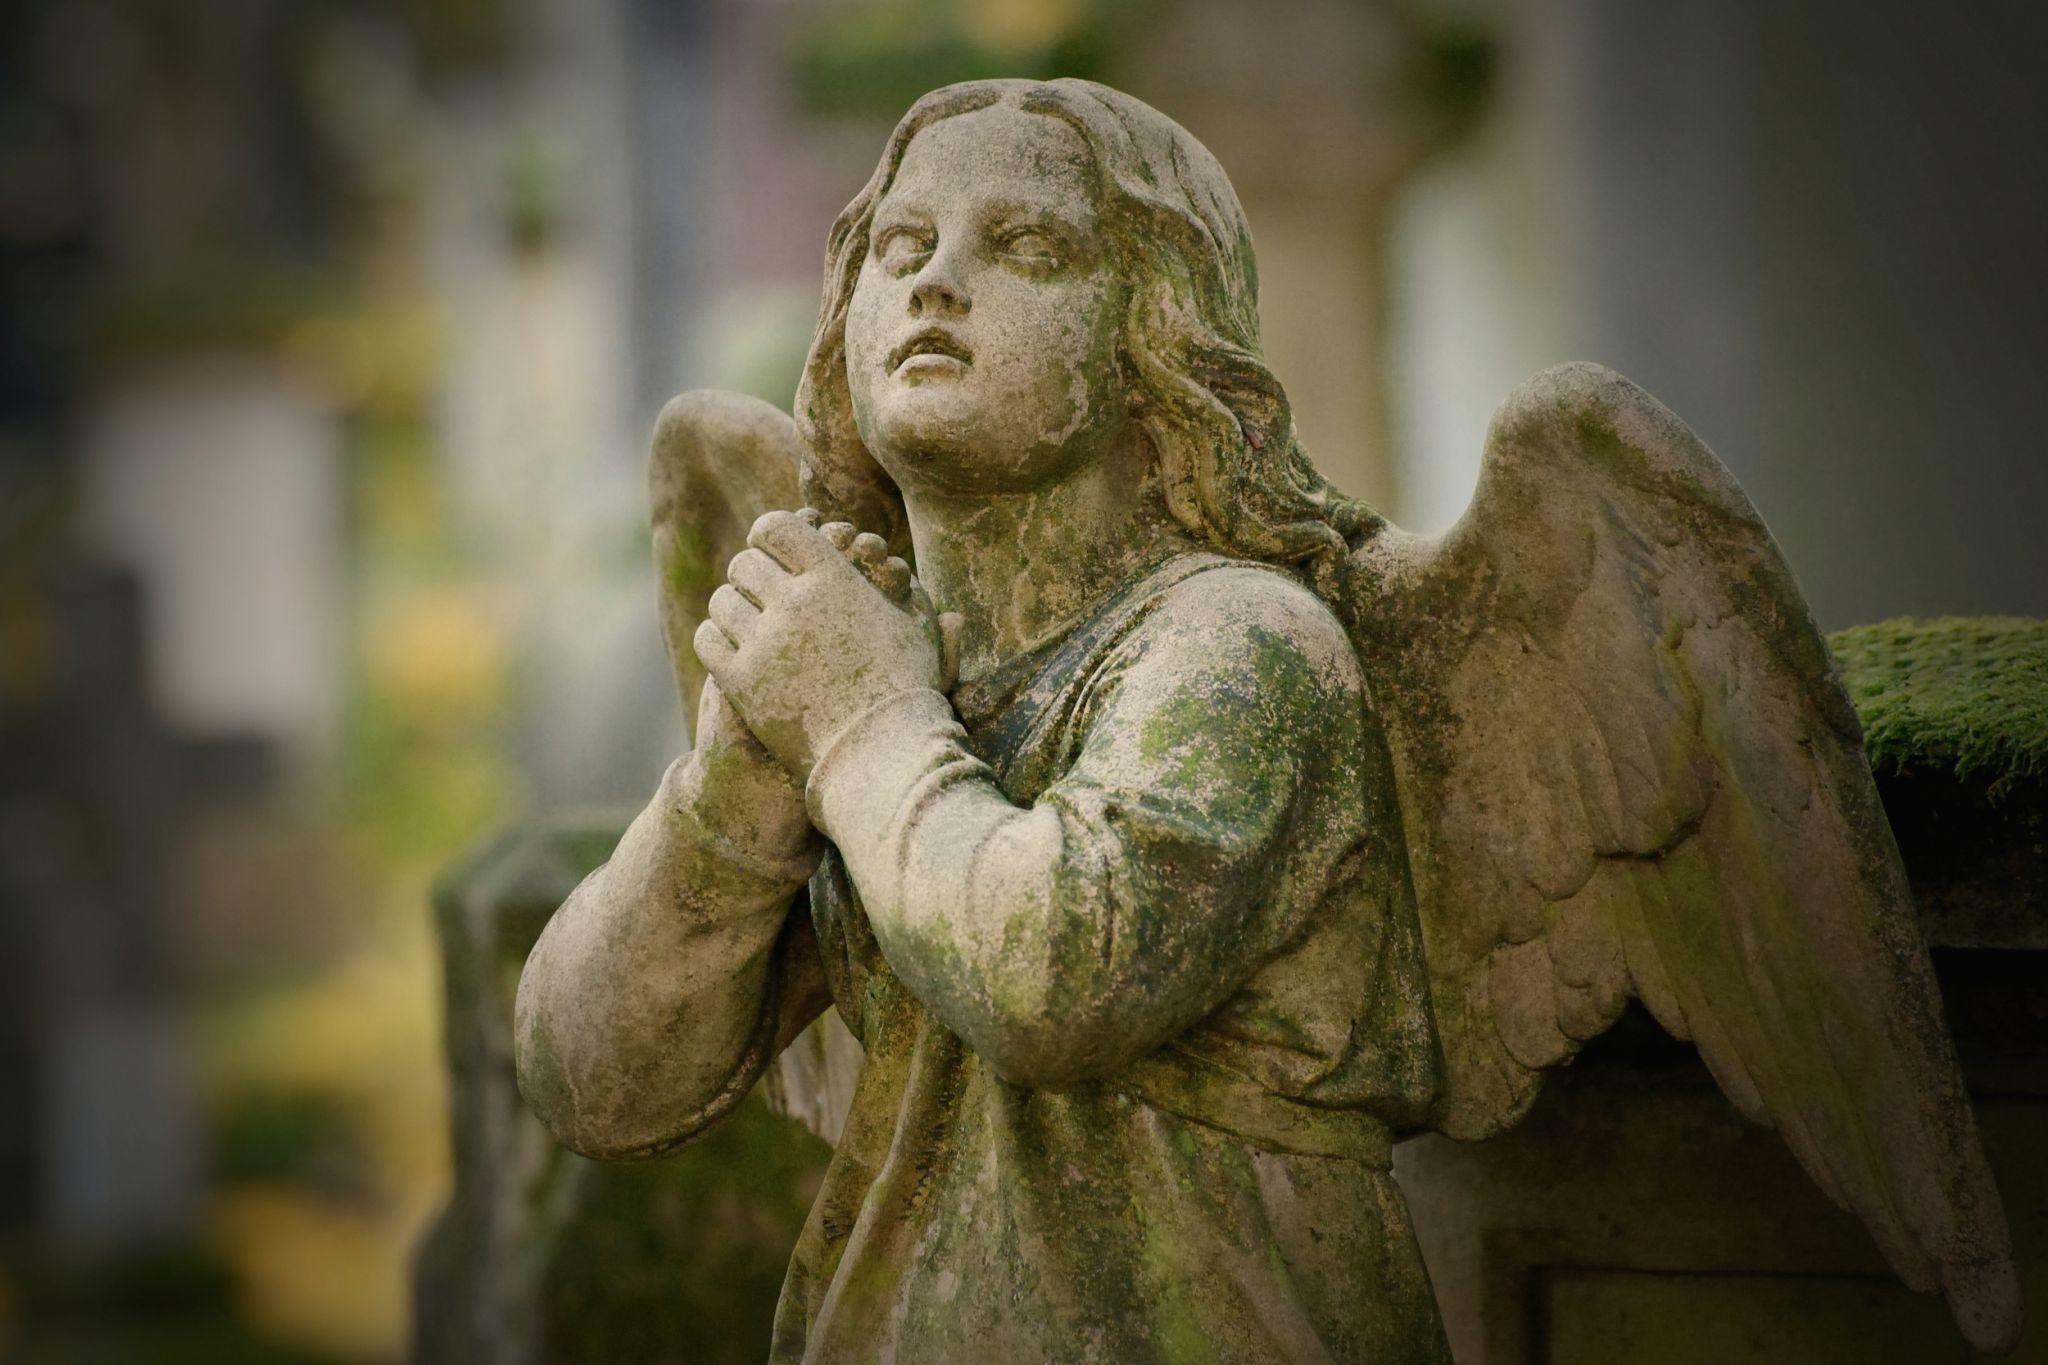 Alter Friedhof, old graveyard, Germany